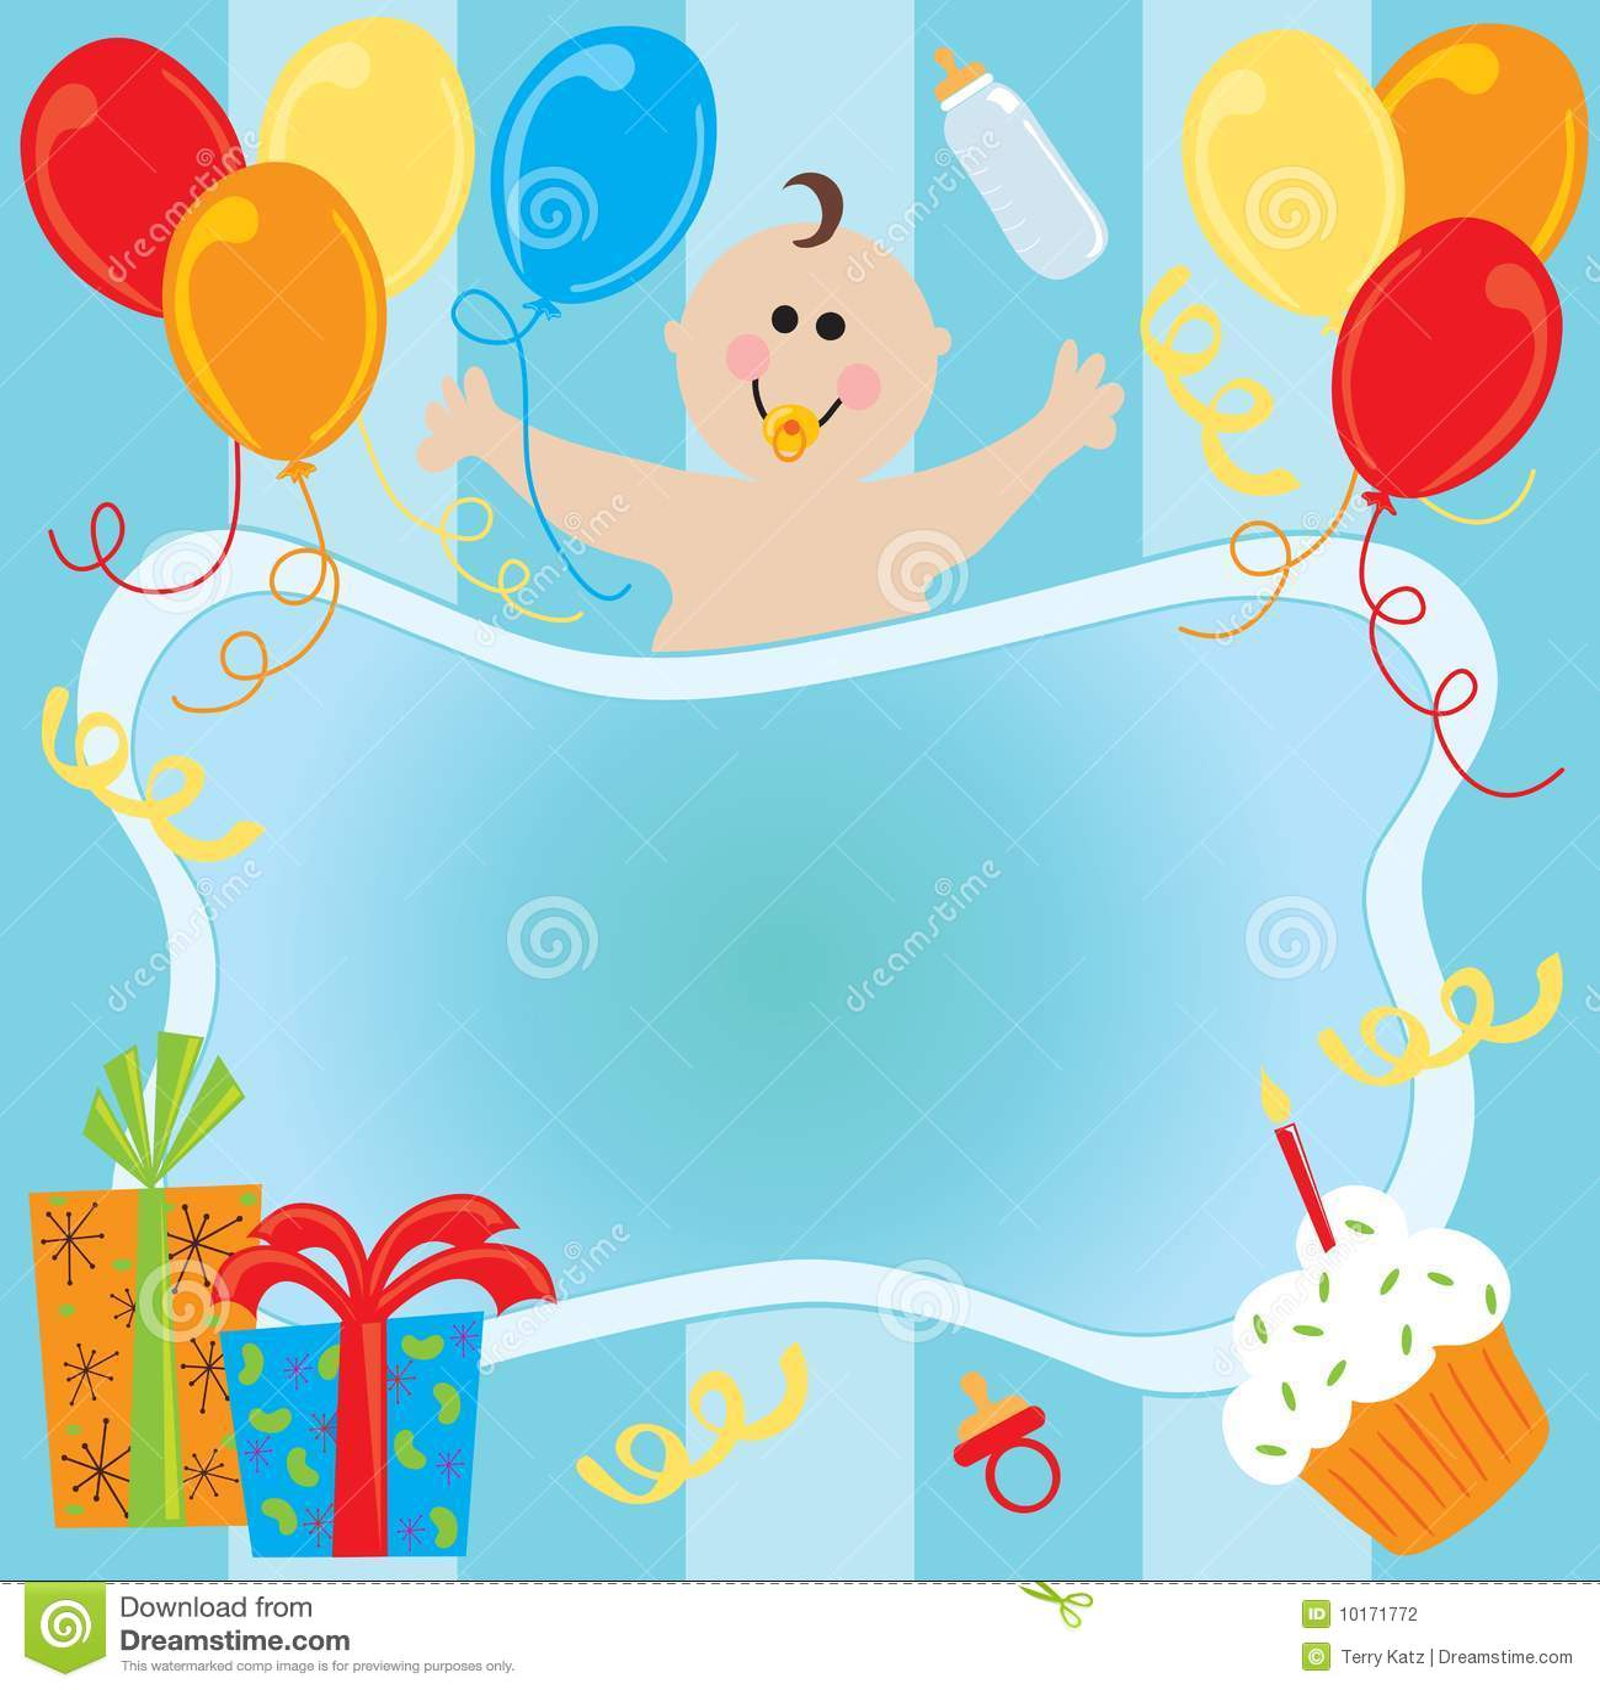 Boy Girl Twin Baby Shower Invitations is beautiful invitation layout